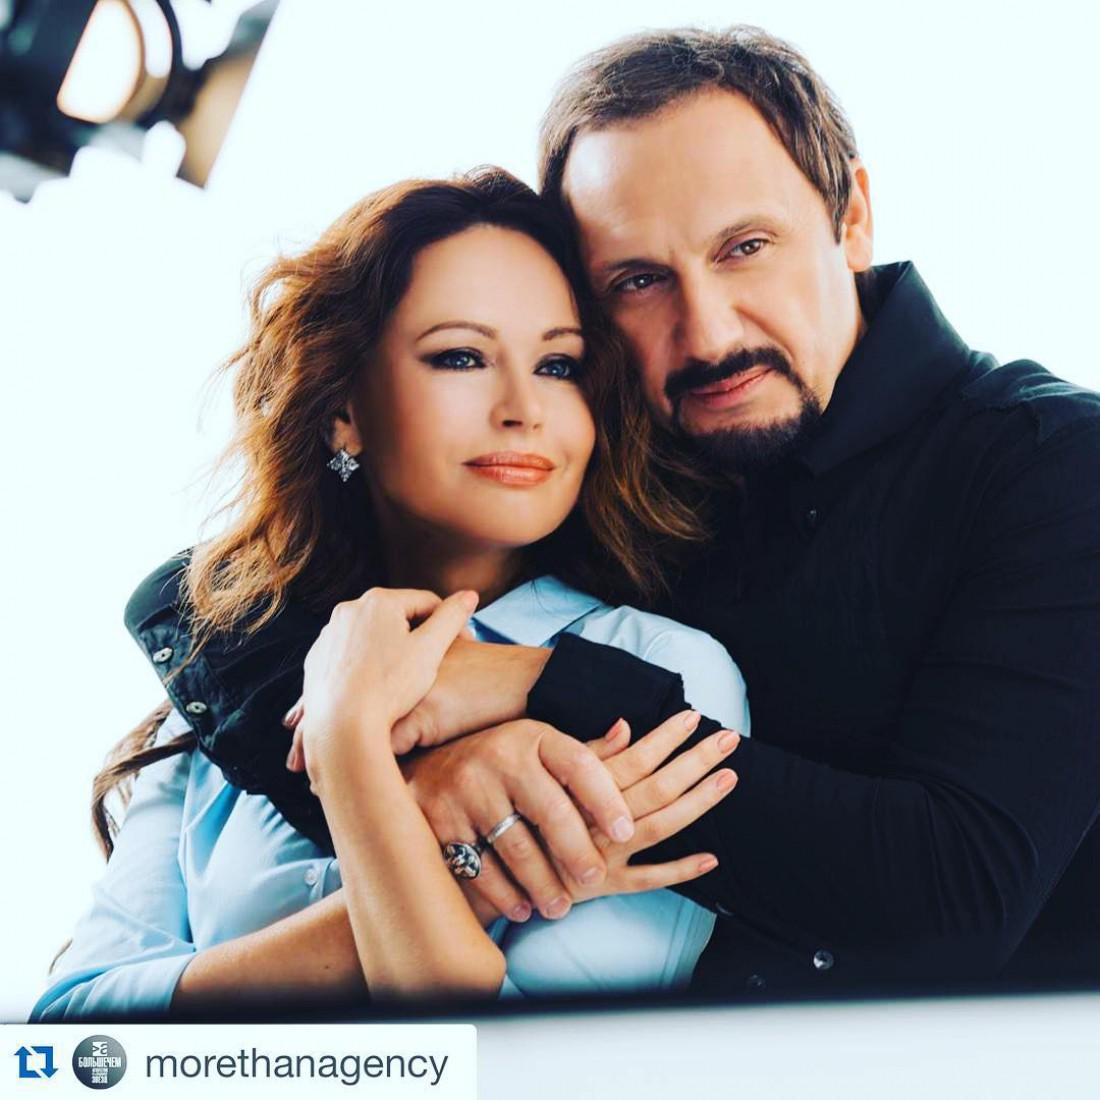 Ирина Безрукова и Стас Михайлов